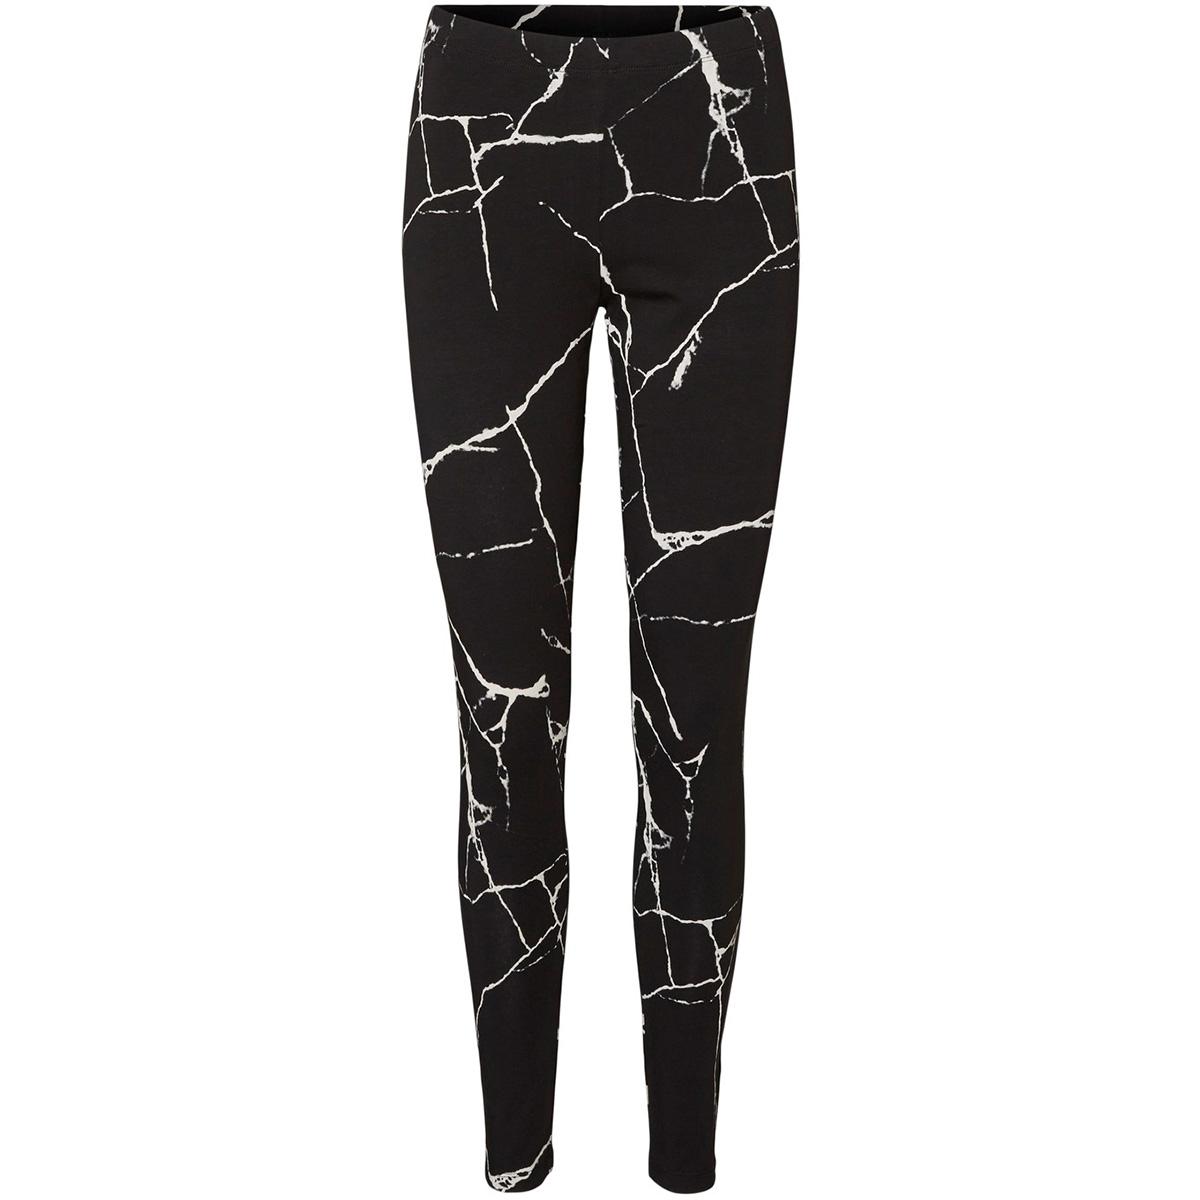 nmkerry nw aop marble legging 27012262 noisy may legging black/black&whi